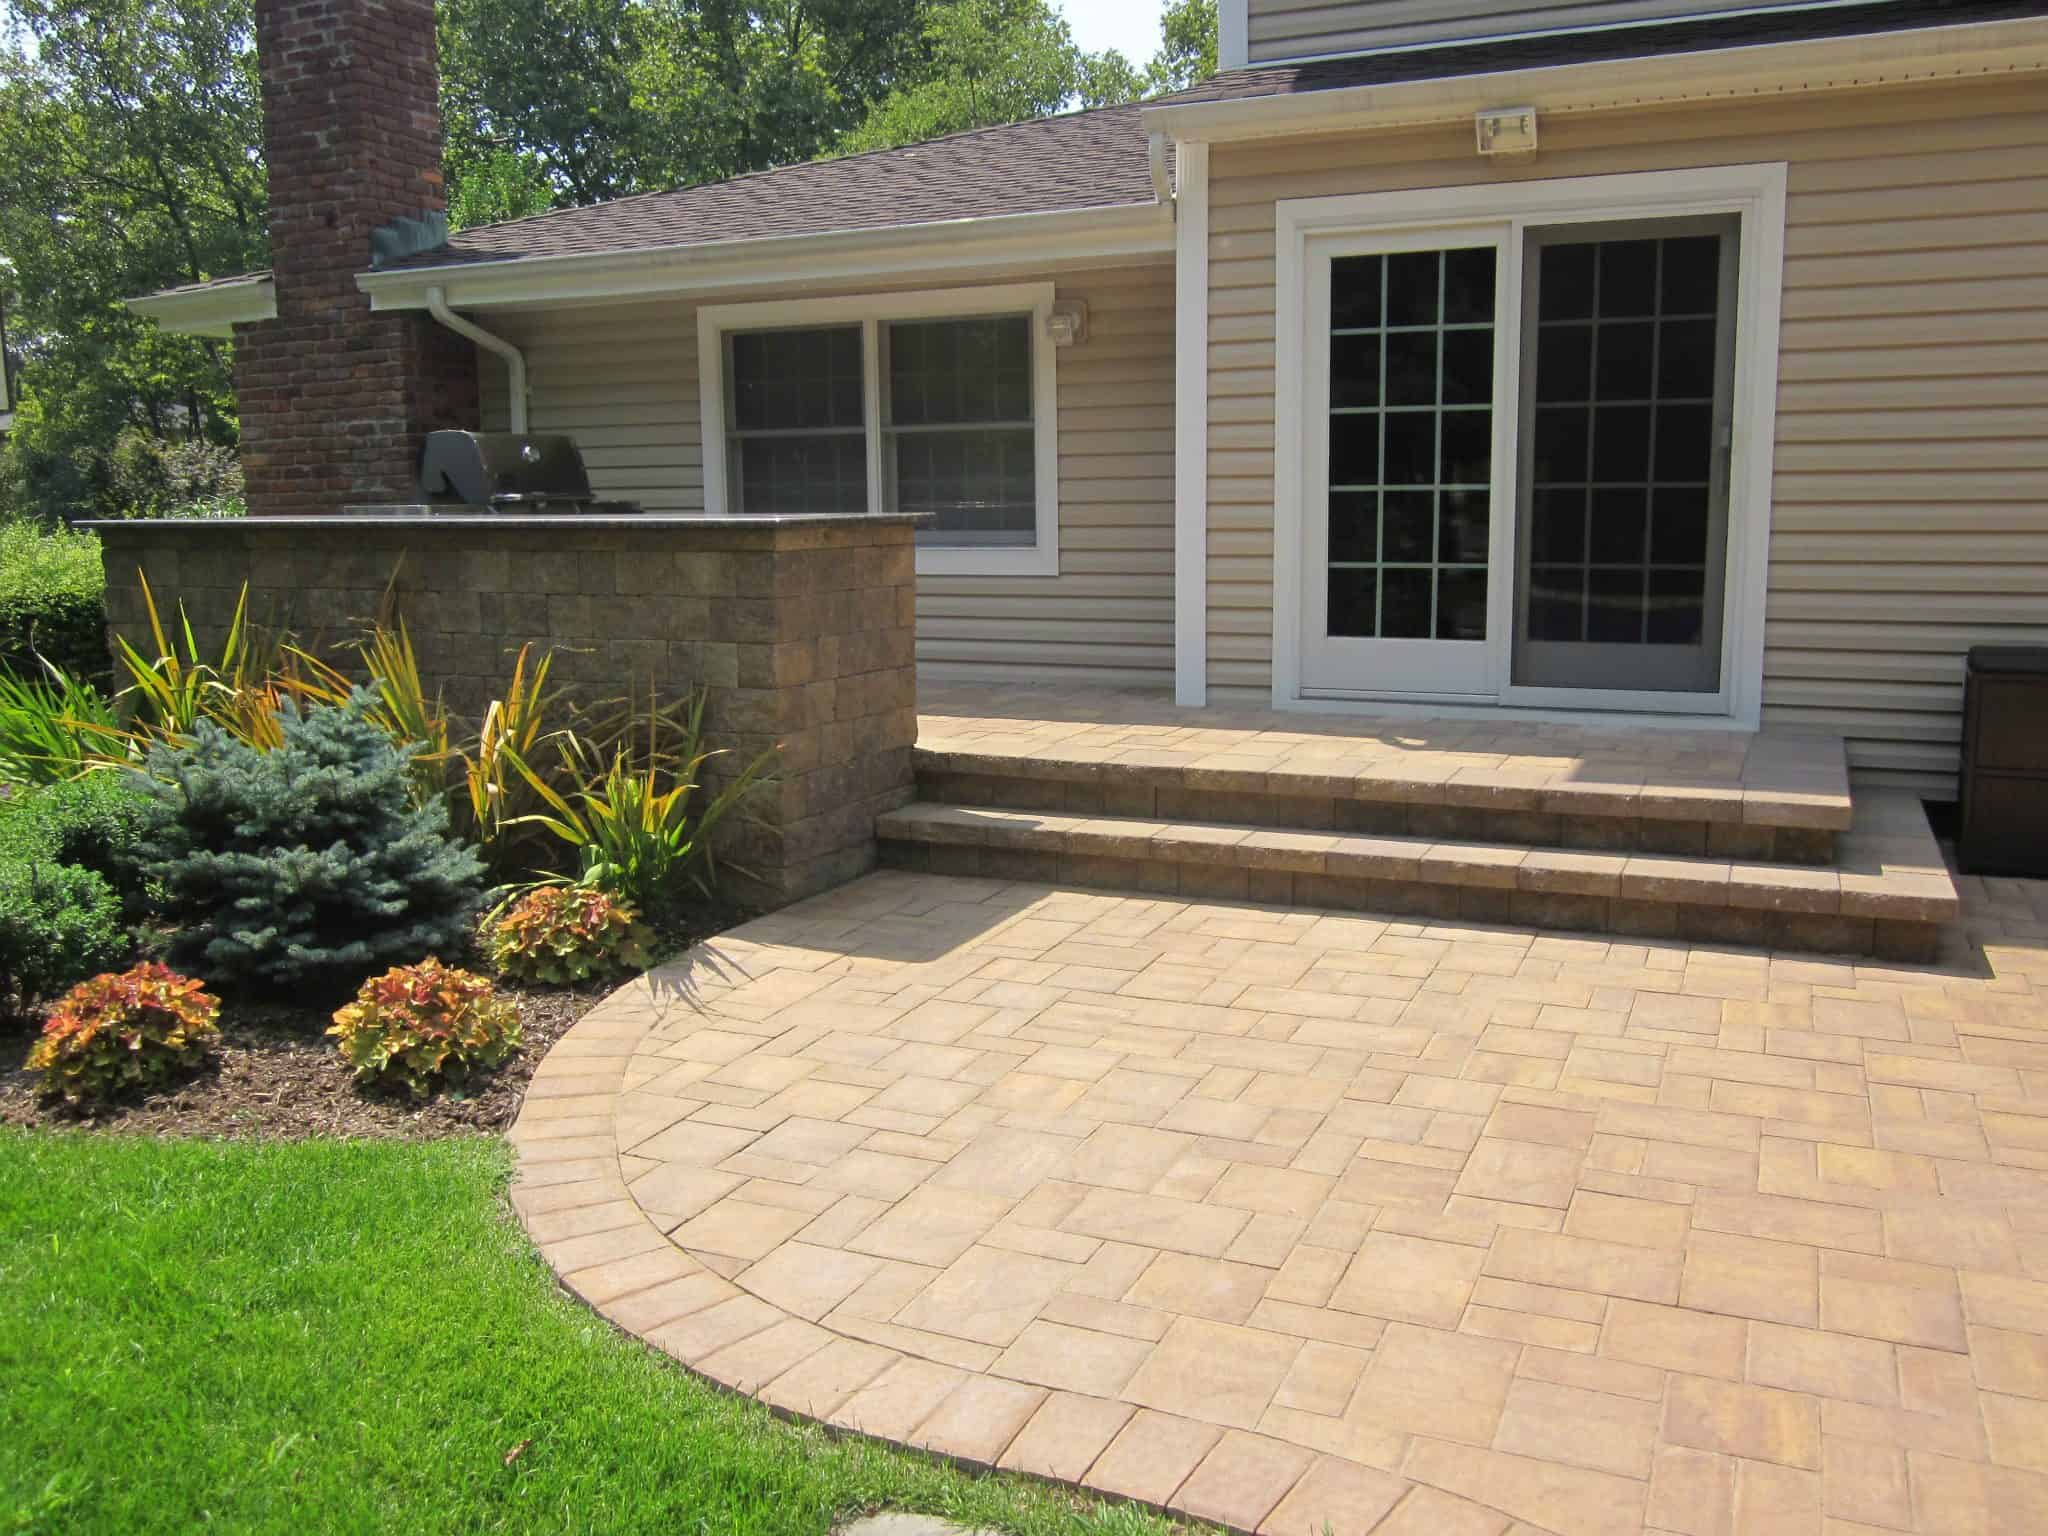 Paver Patio - Cambridge Ledgestone Patio and Stoop -Sahara Chestnut- Random Pattern - Dix Hills, Long Island NY